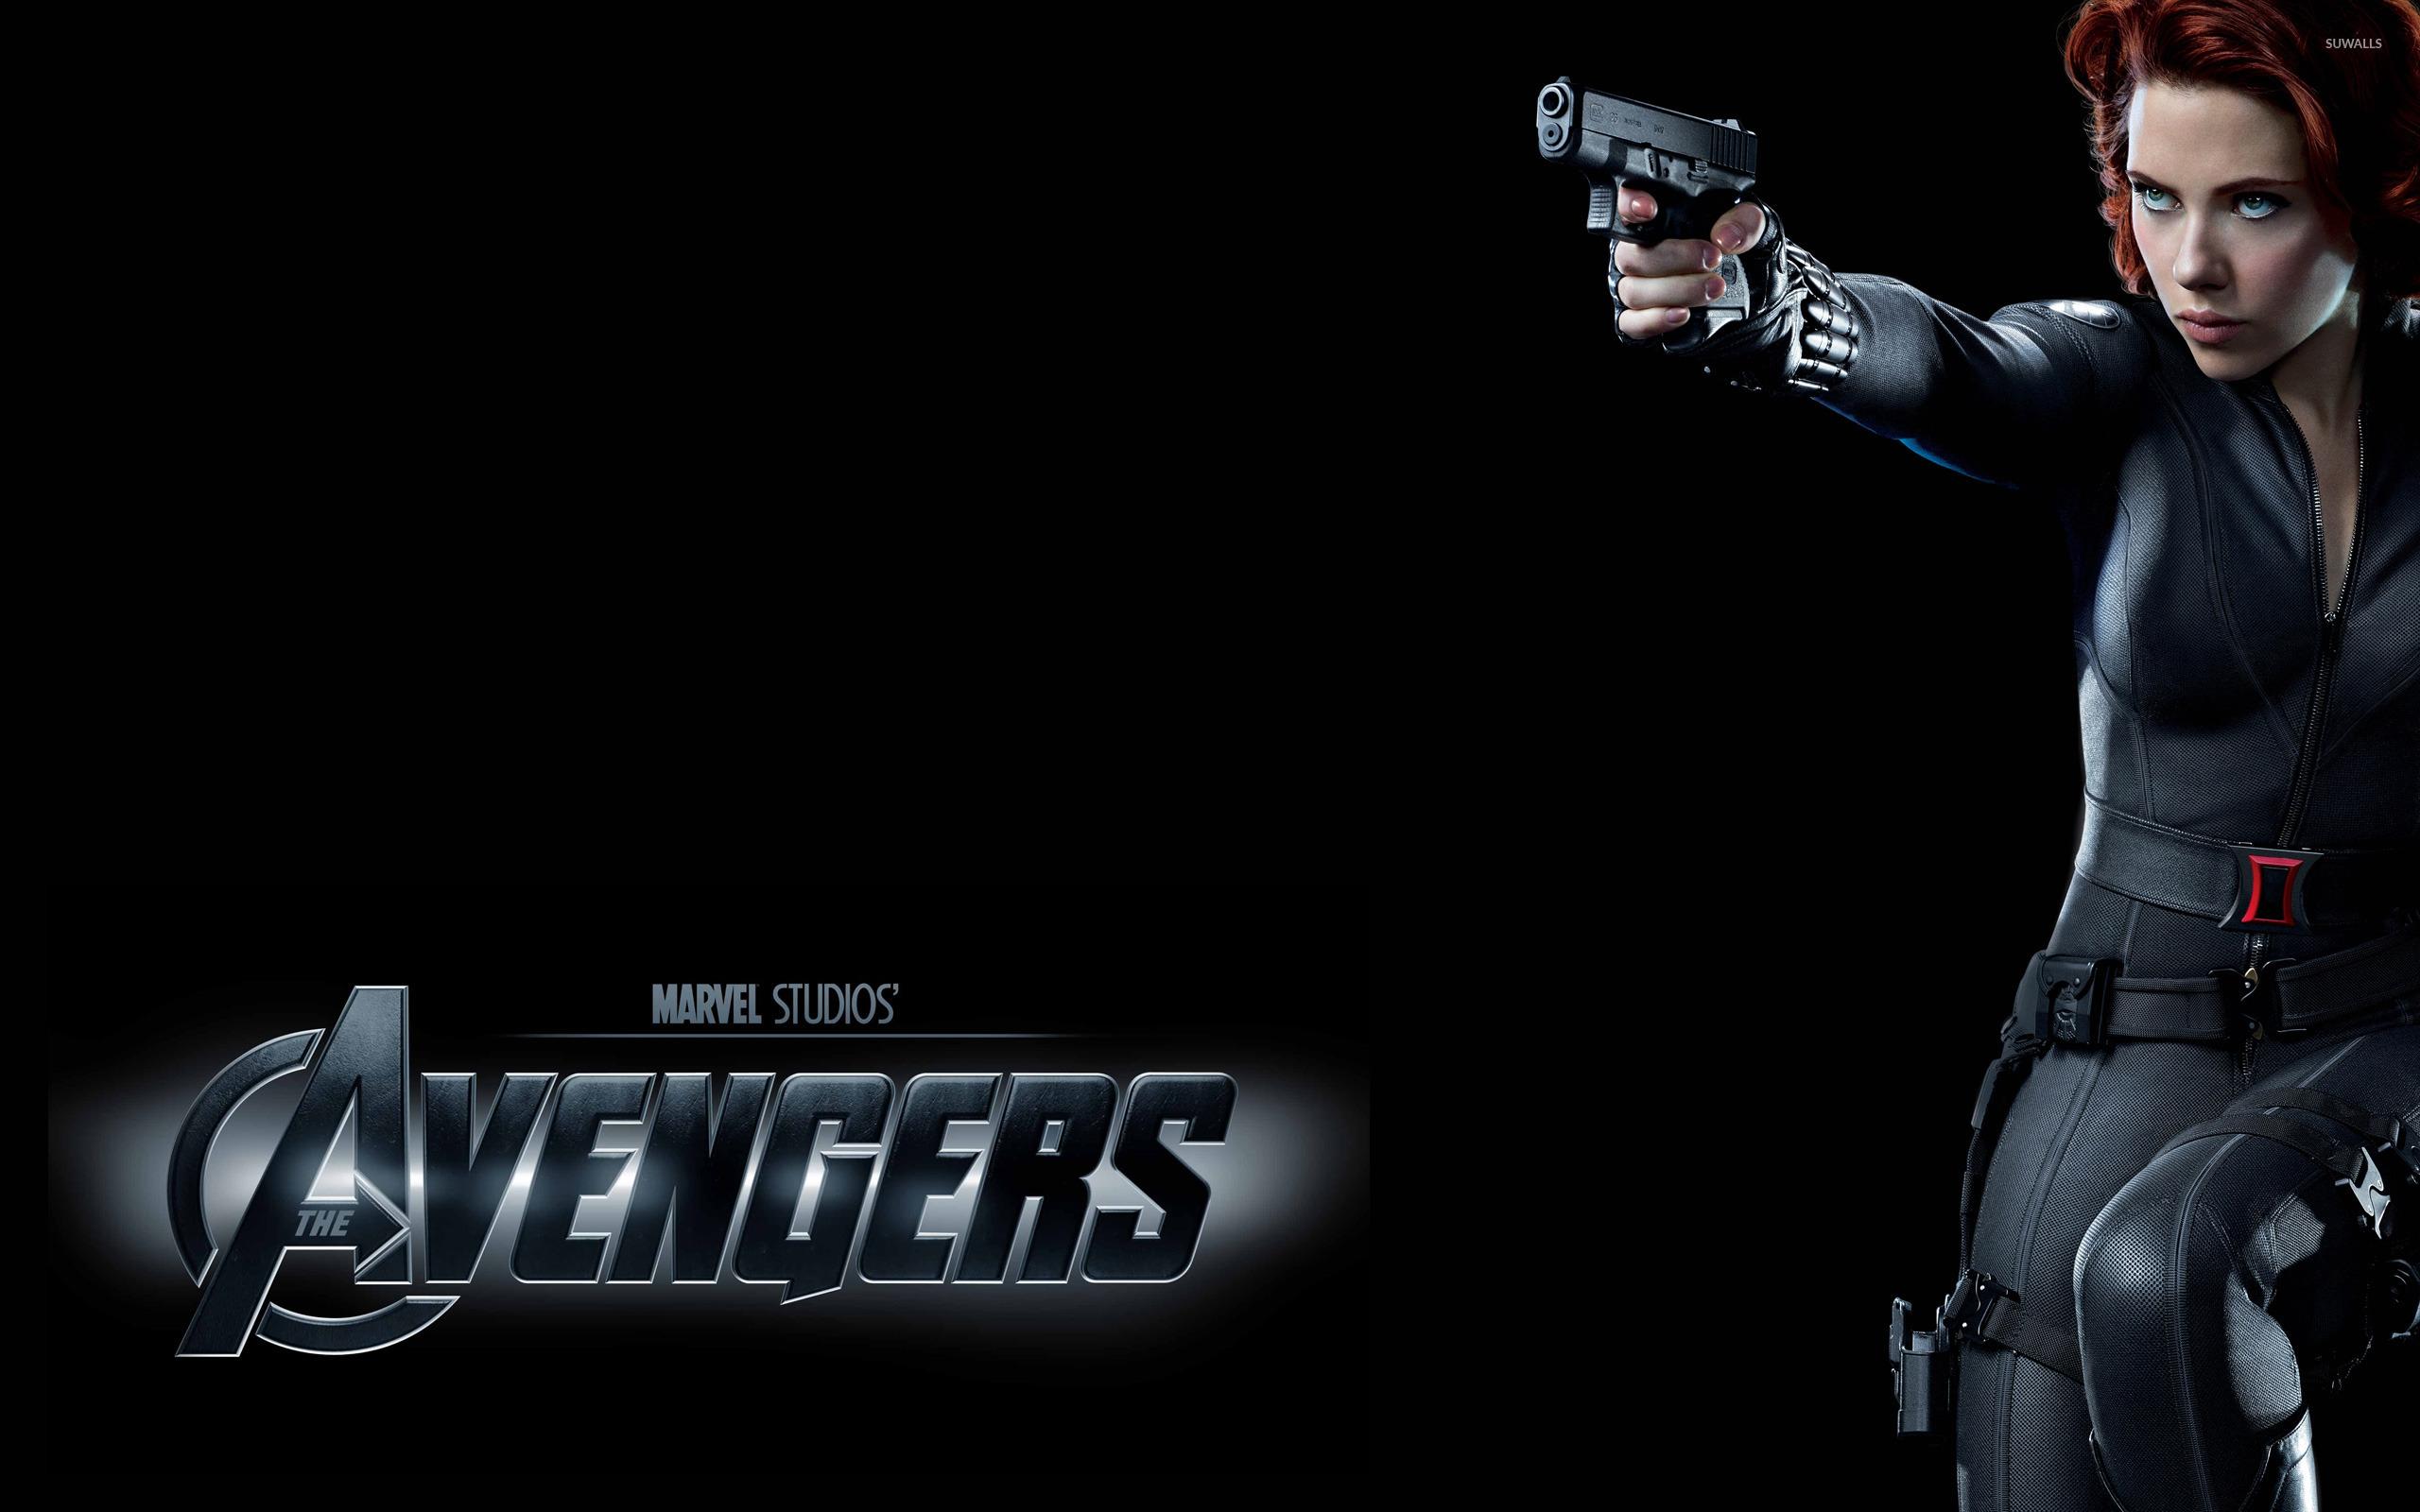 Black Widow   The Avengers wallpaper   Movie wallpapers   10843 2560x1600